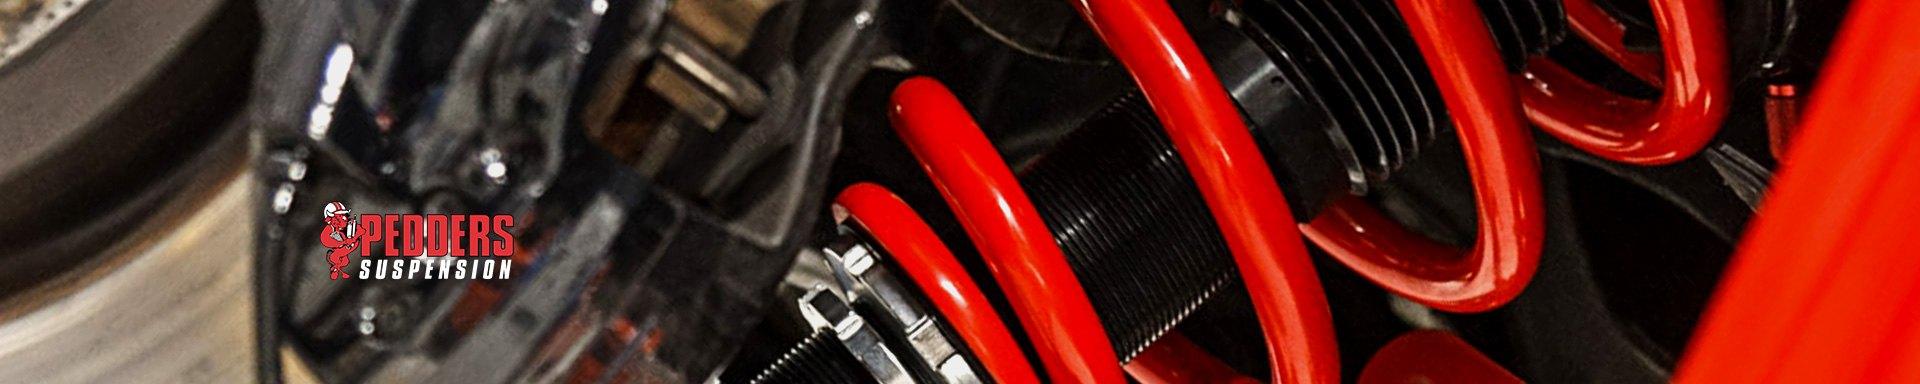 Pedders Suspension™ | Adjustable Coilovers, Springs, Shocks